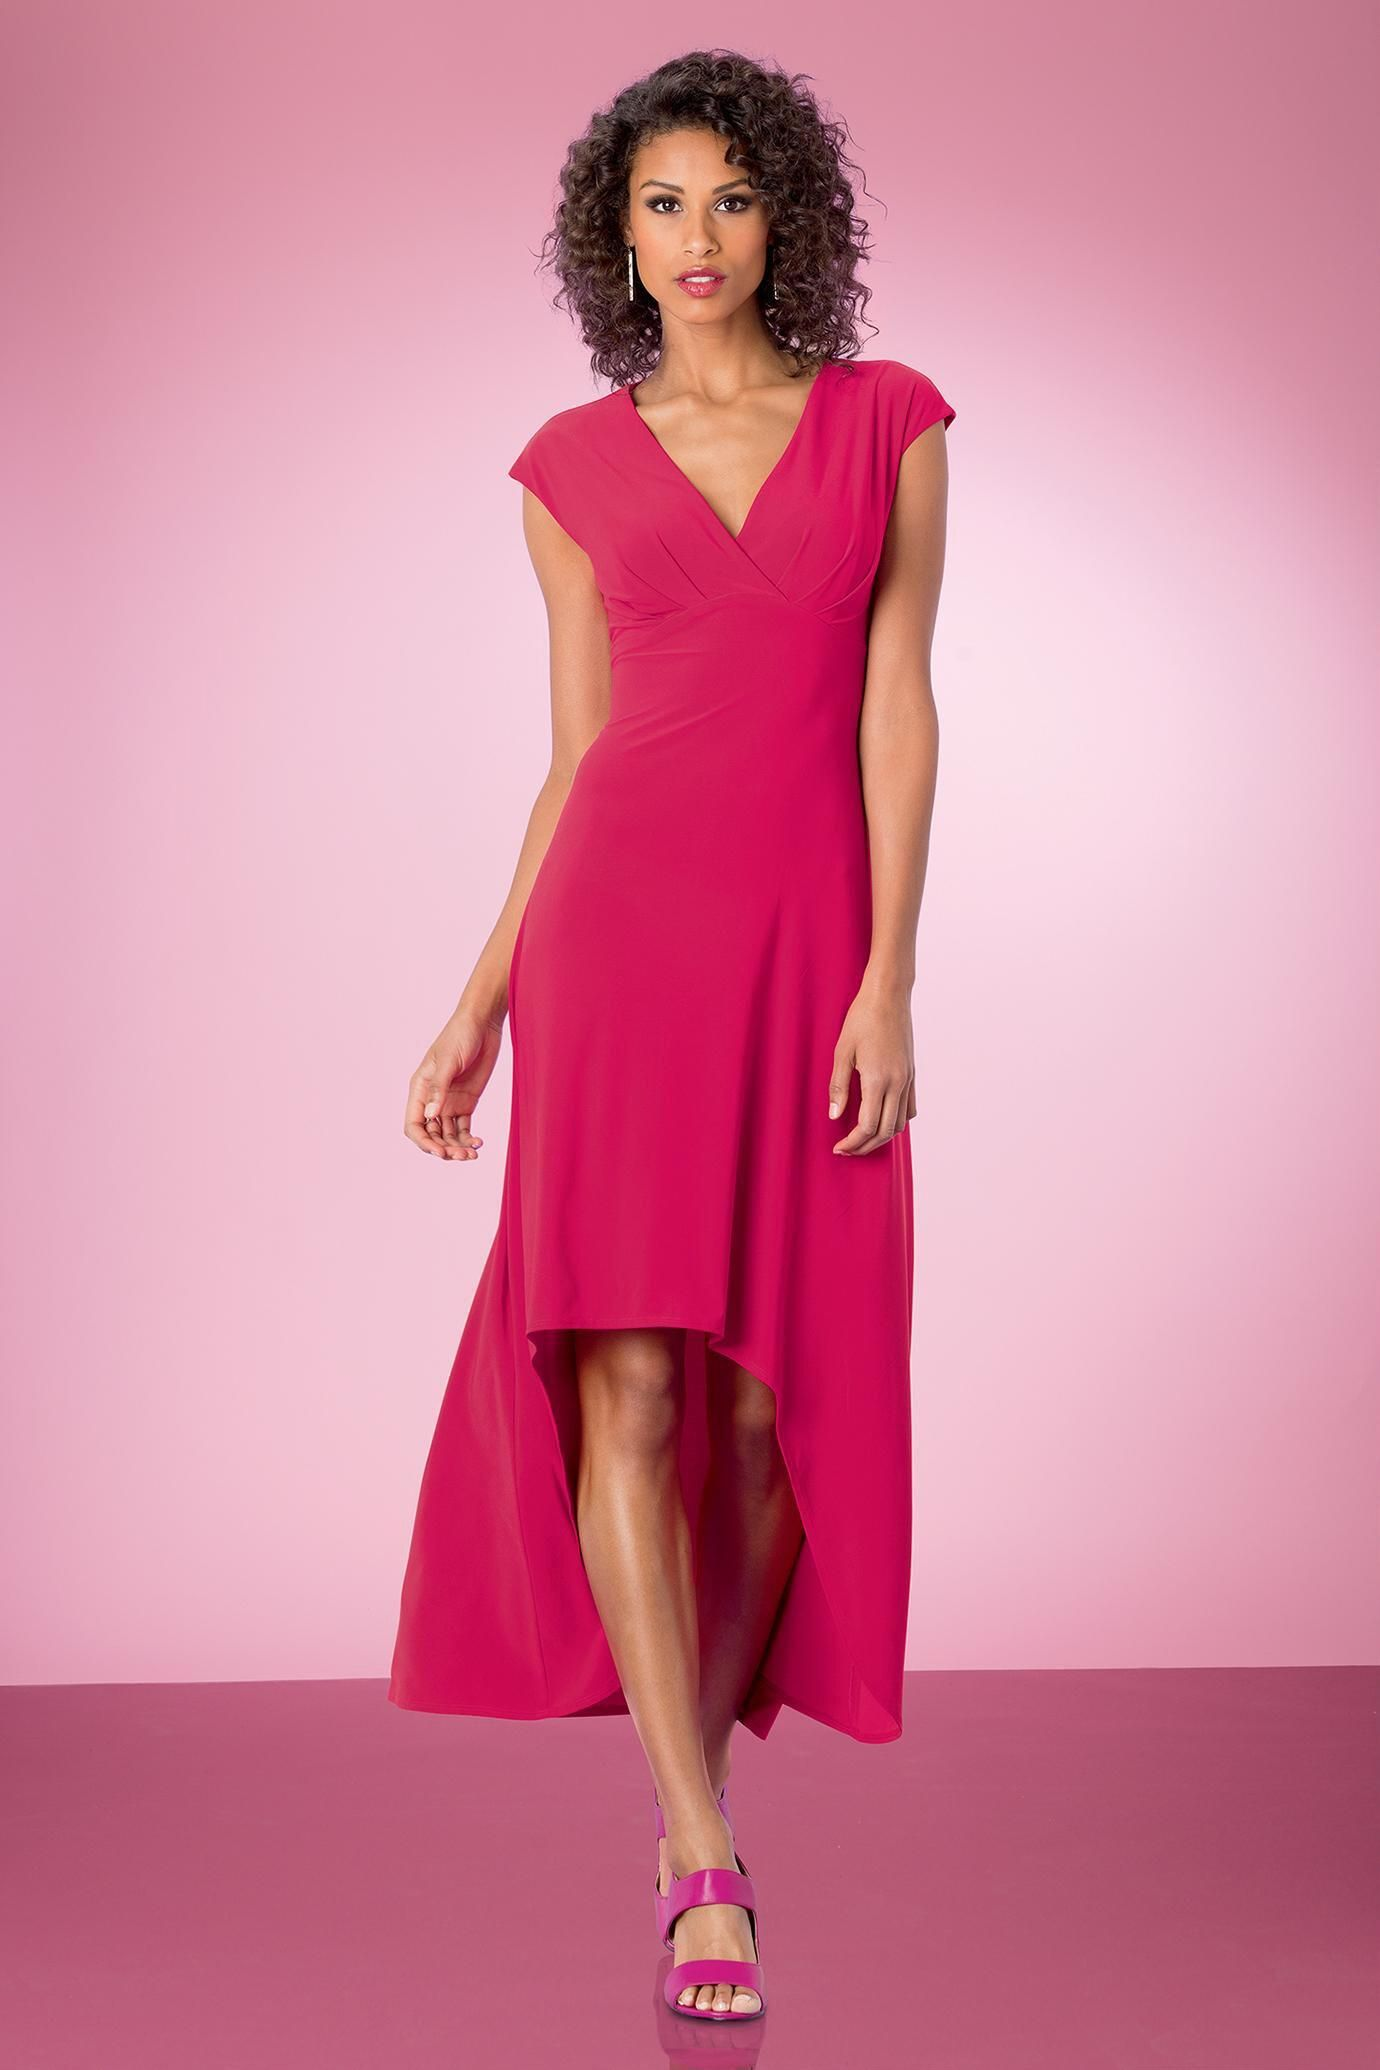 High Low Cap Sleeve Dress | Clothing | Pinterest